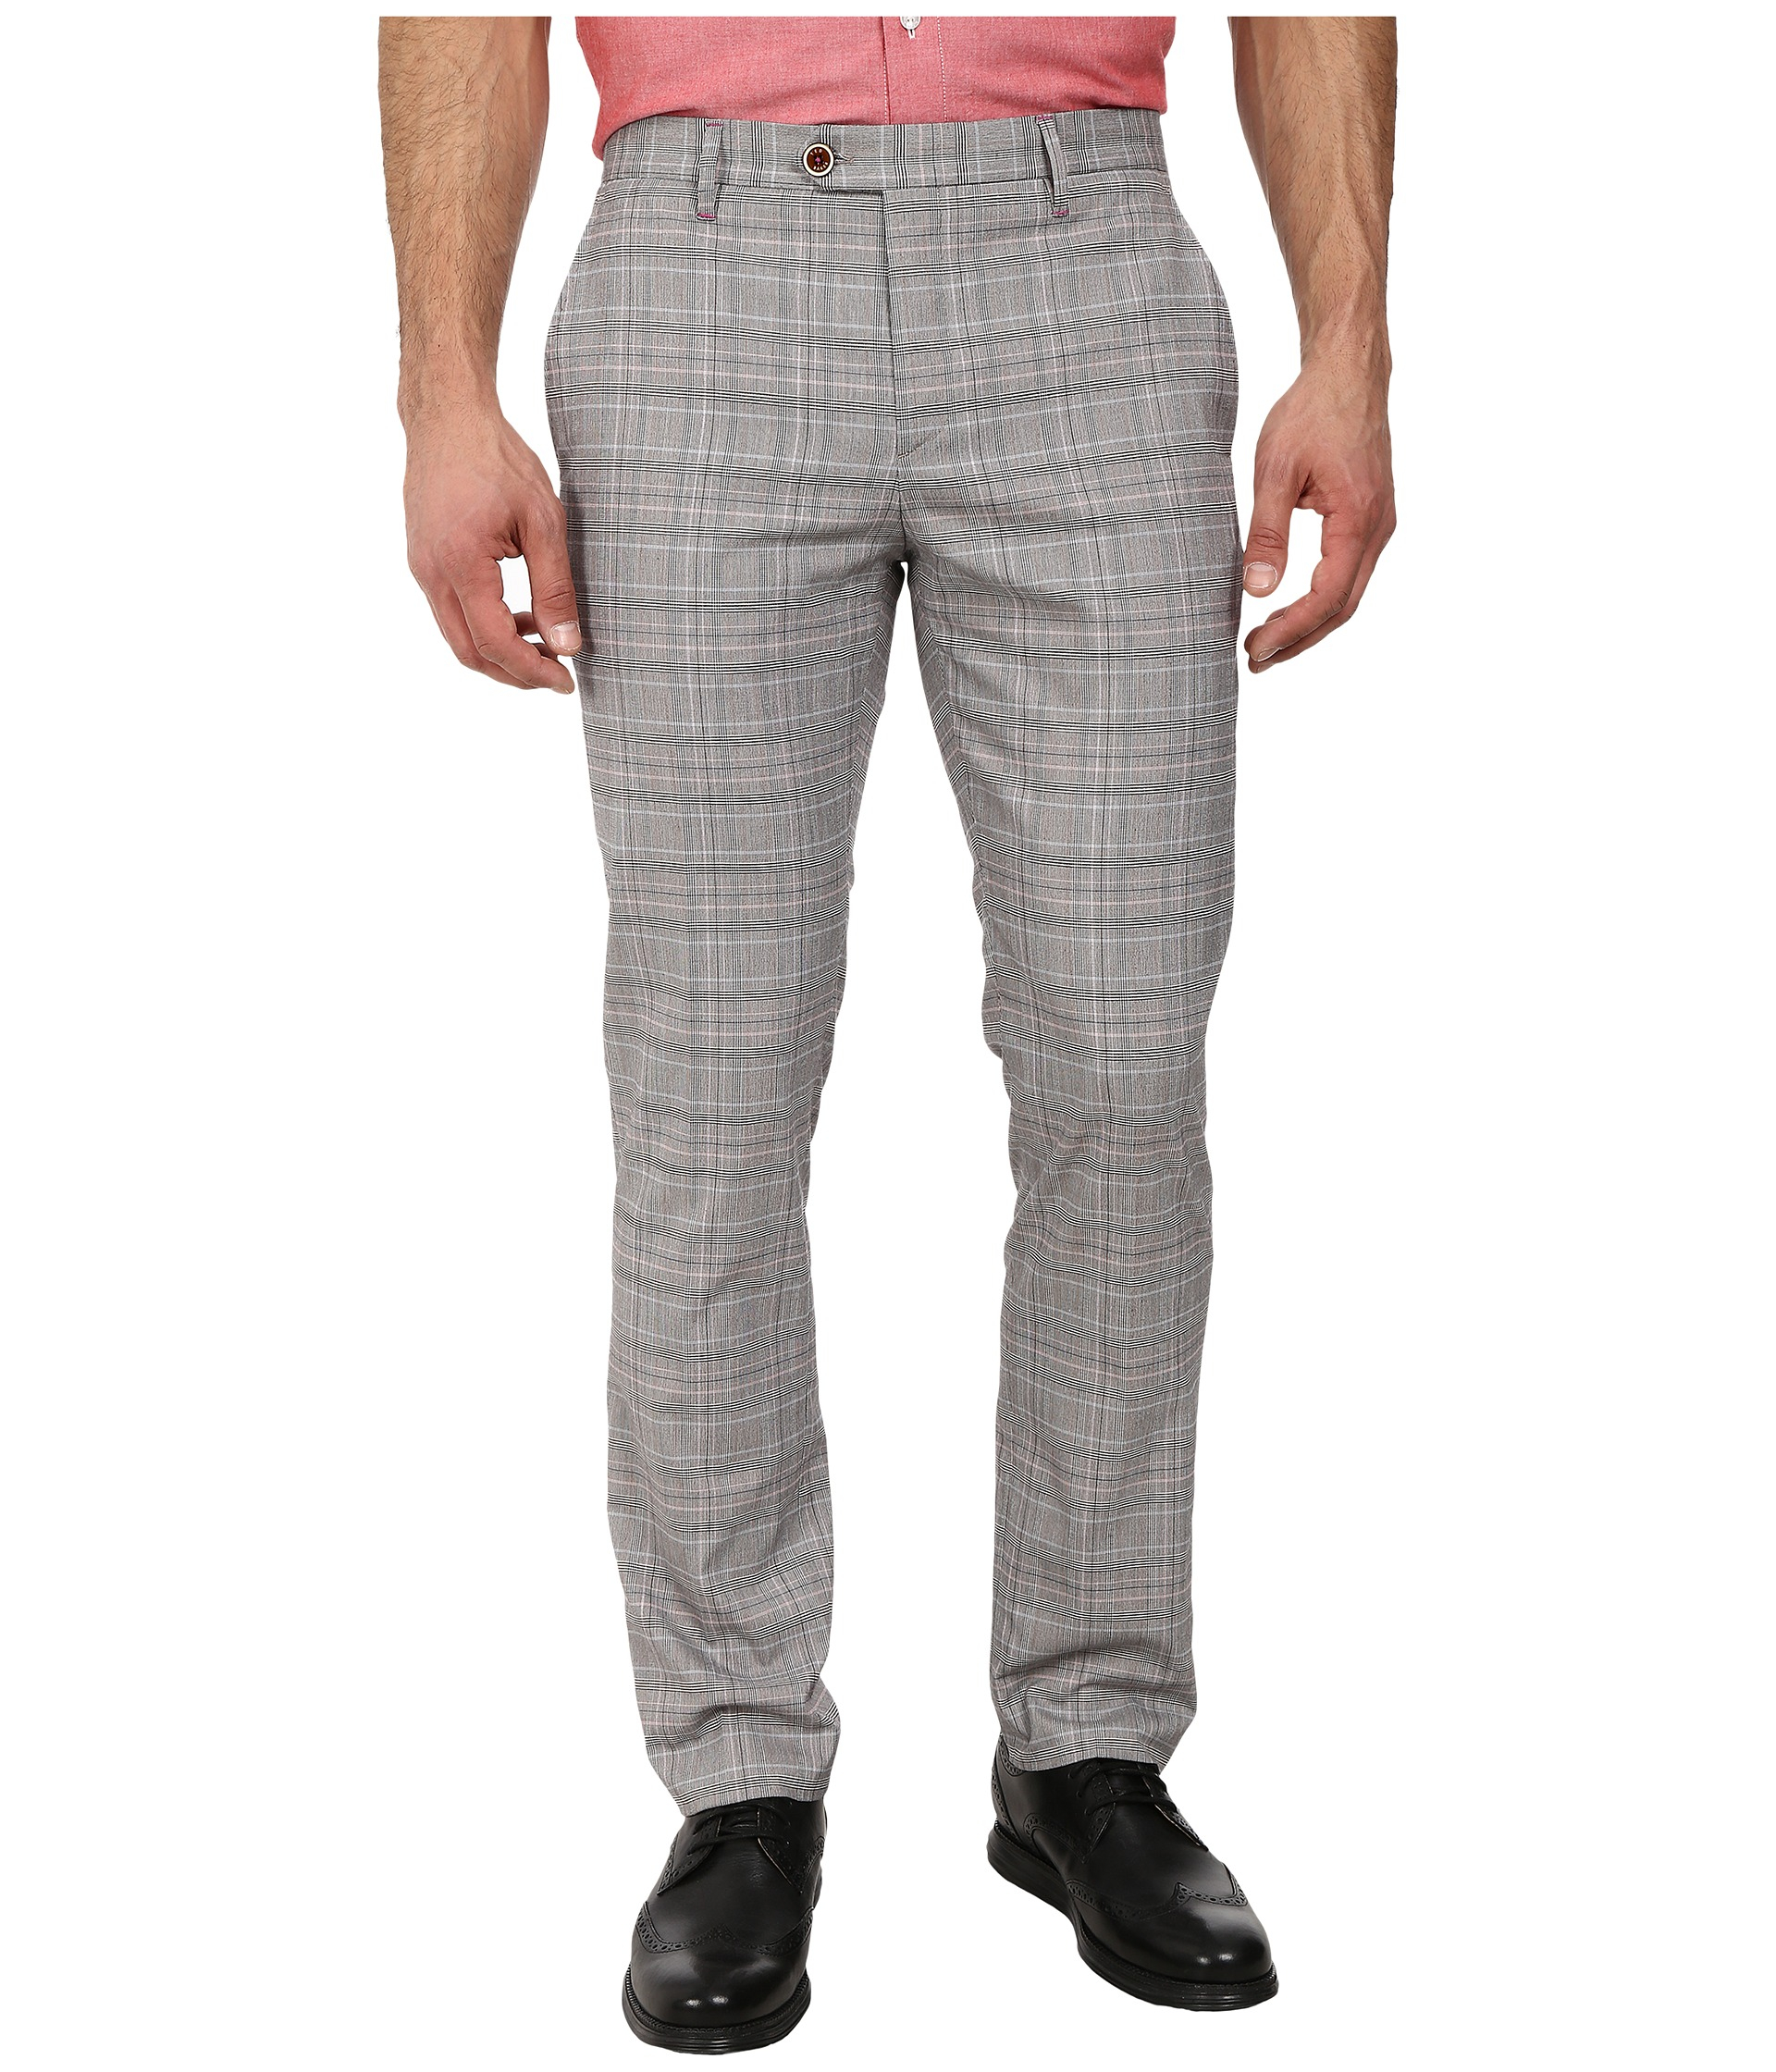 Ted Baker Mens Havtro Check Trousers Natural - Pants